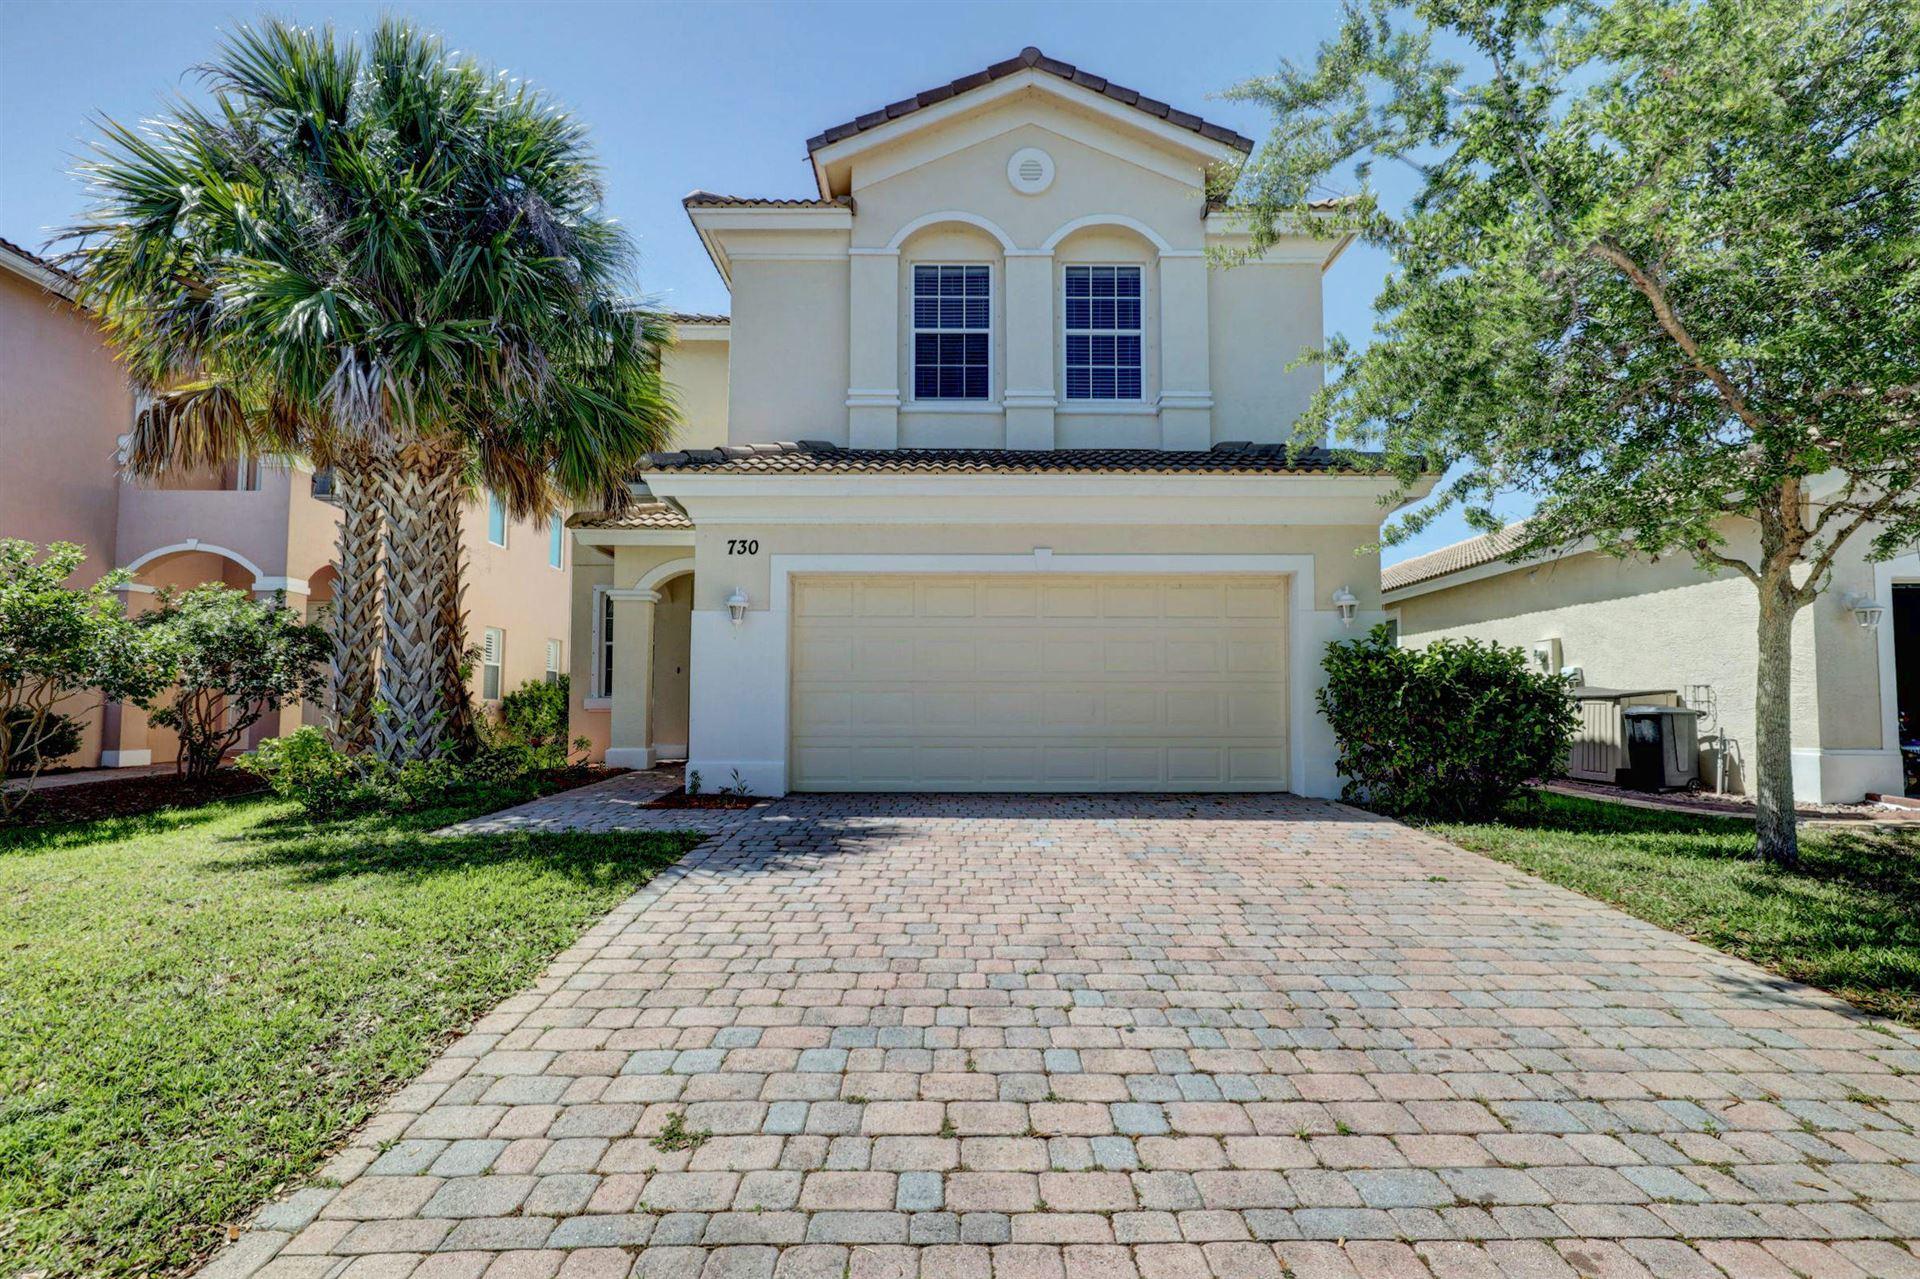 730 NW Leonardo Circle, Port Saint Lucie, FL 34986 - #: RX-10612912